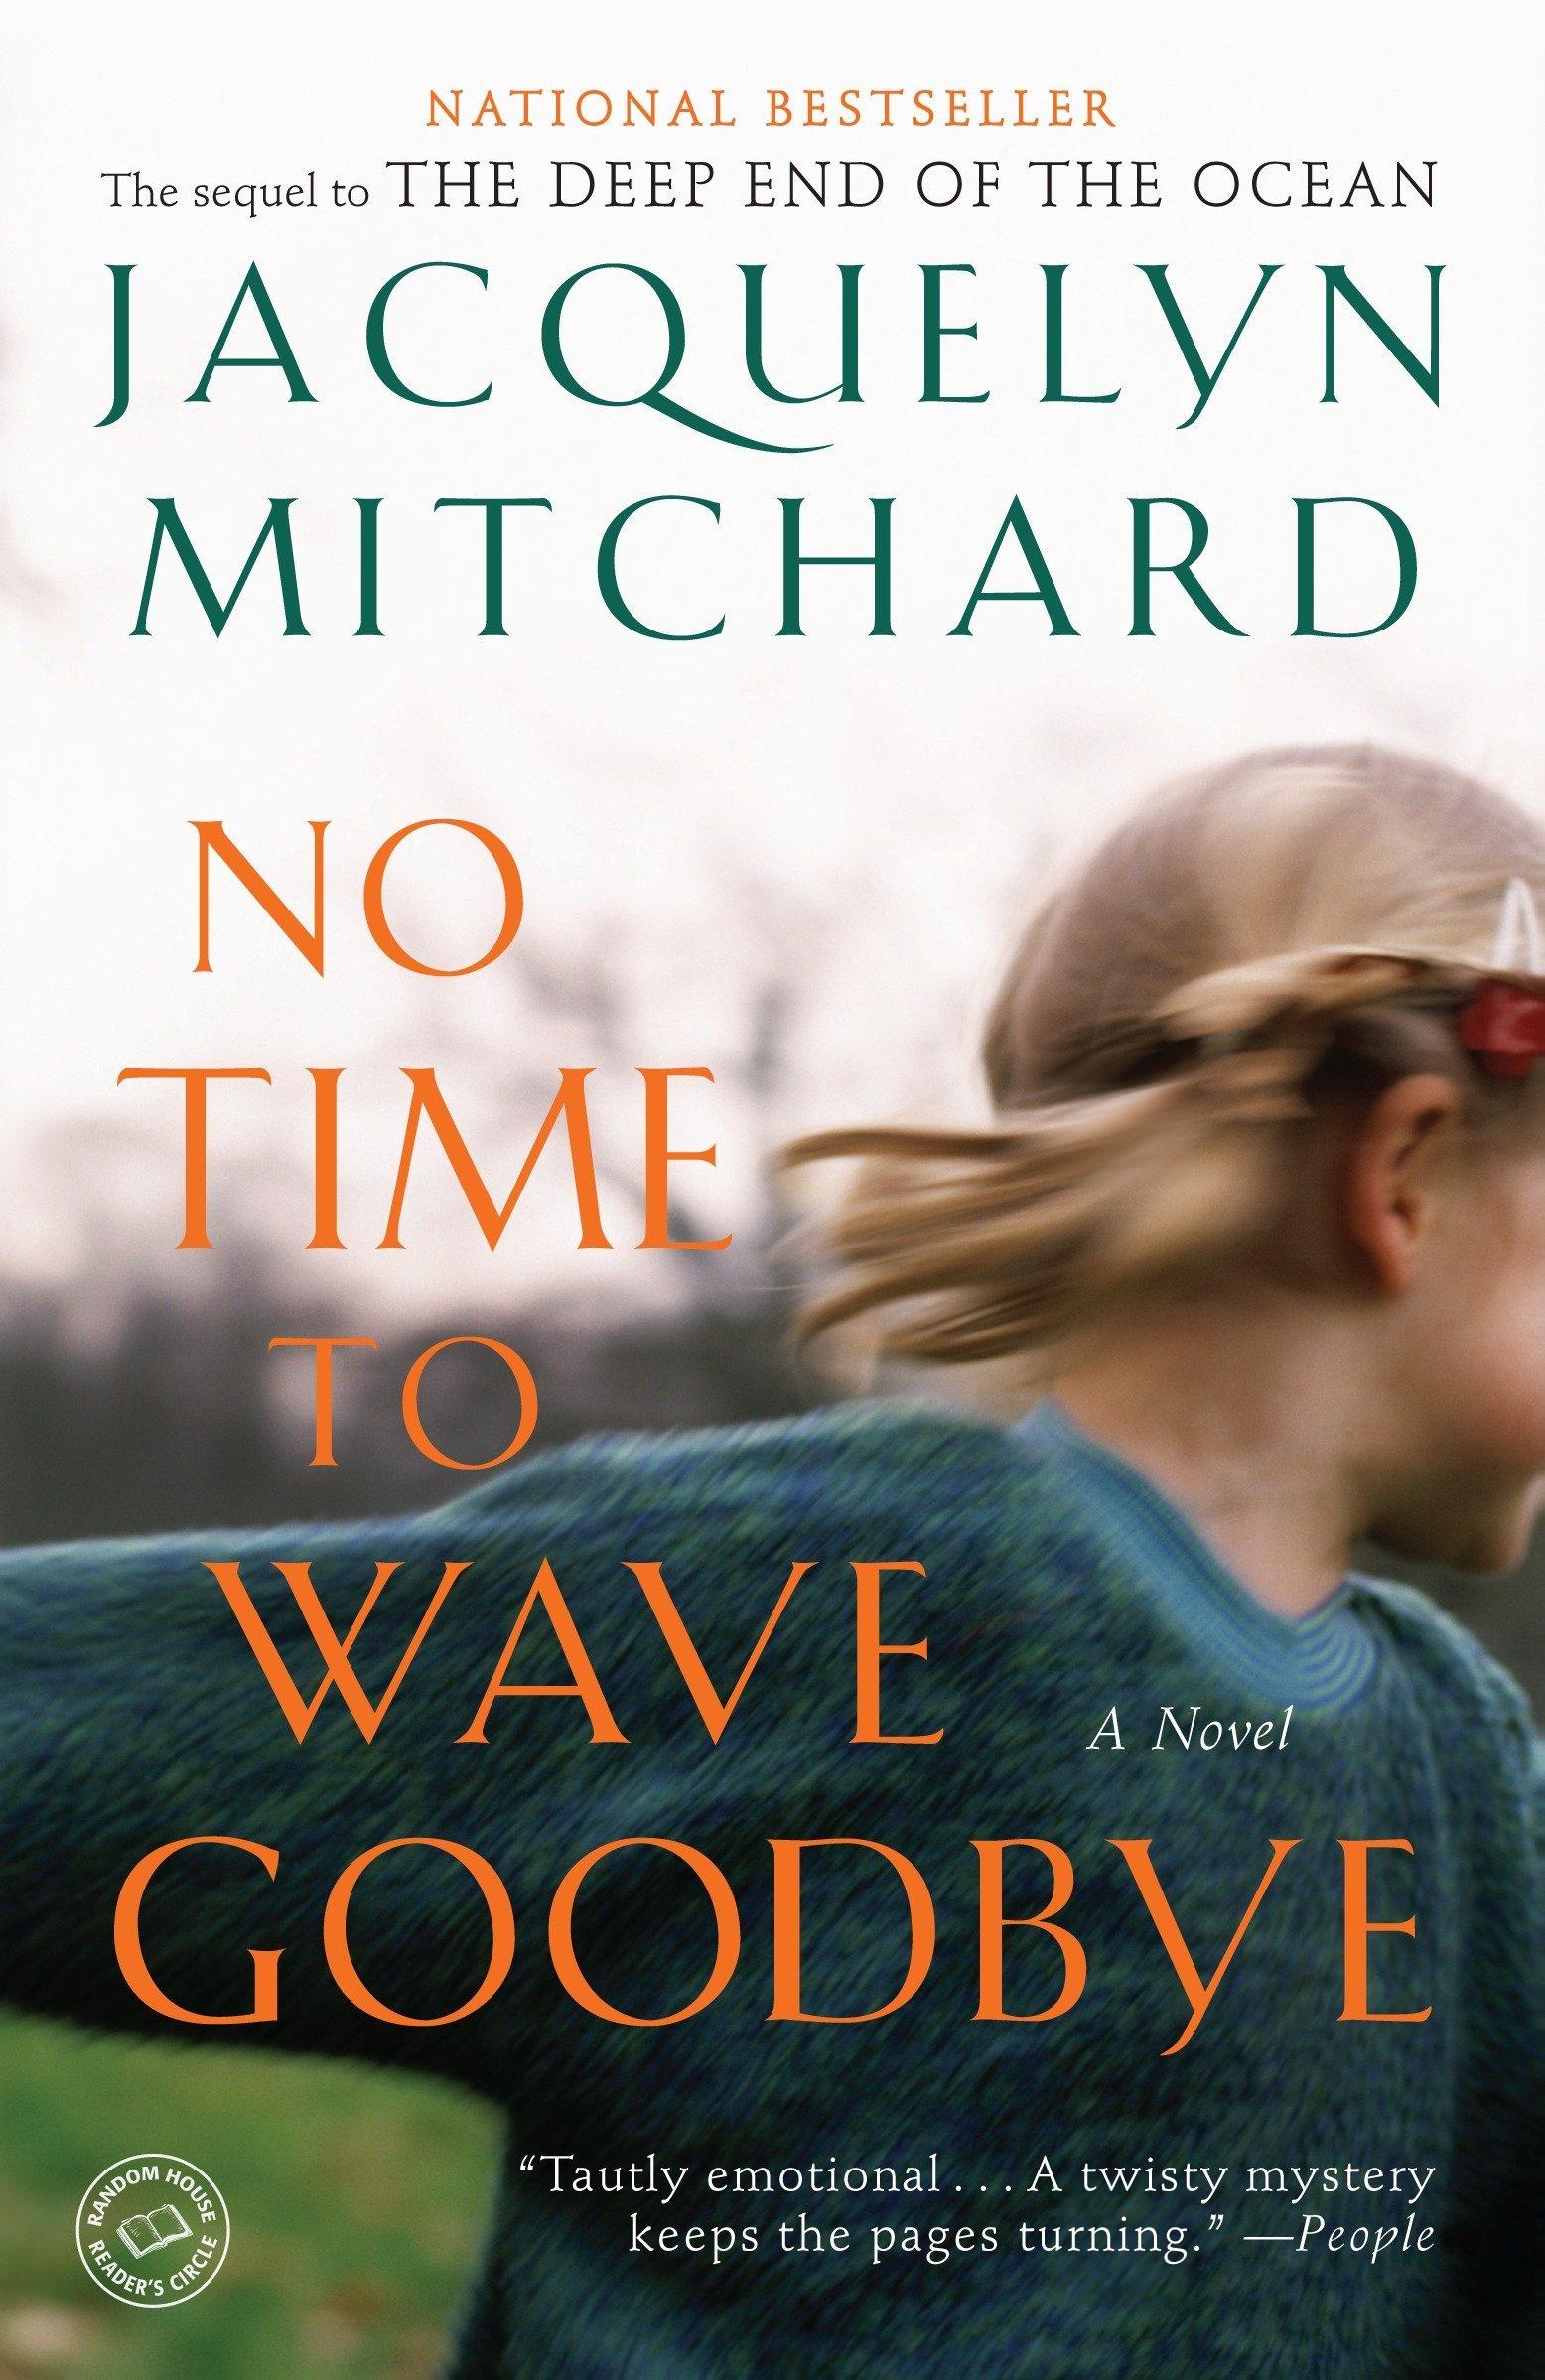 No Time to Wave Goodbye: A Novel (A Cappadora Family Novel): Jacquelyn  Mitchard: 9780812979572: Amazon.com: Books